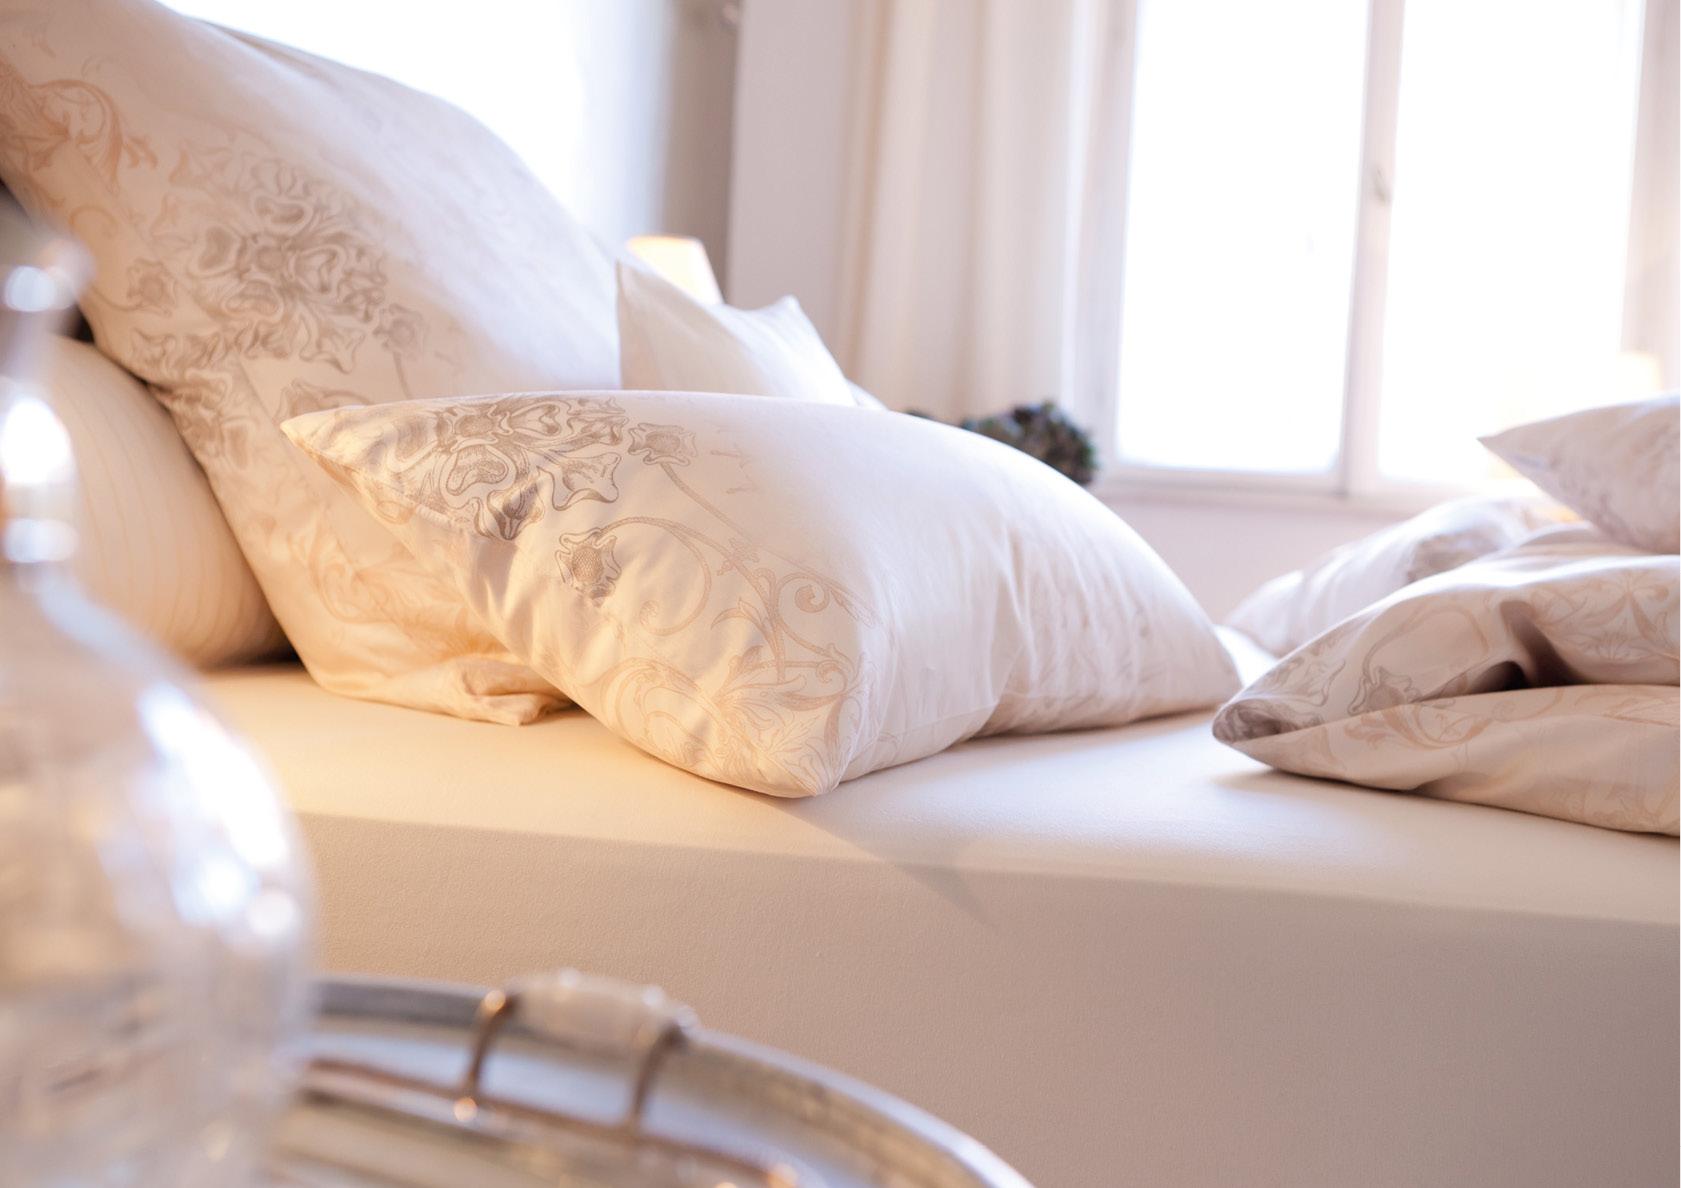 svizzera betten thoba handels gmbh. Black Bedroom Furniture Sets. Home Design Ideas